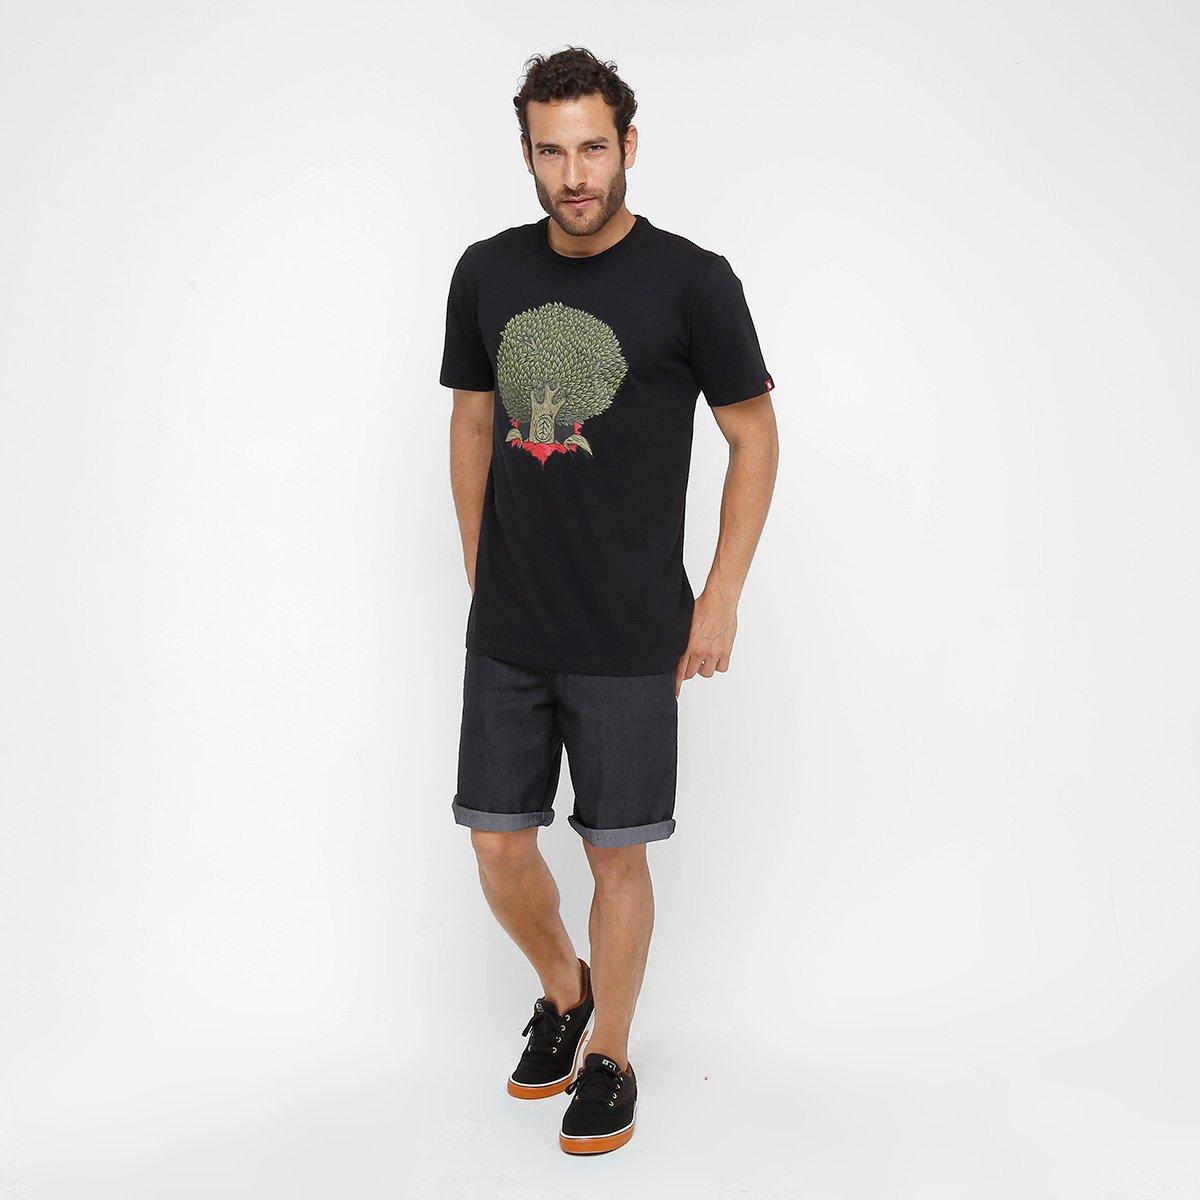 Camiseta Element Pushin Tree Ripper Masculina - Compre Agora  6adacf835cf